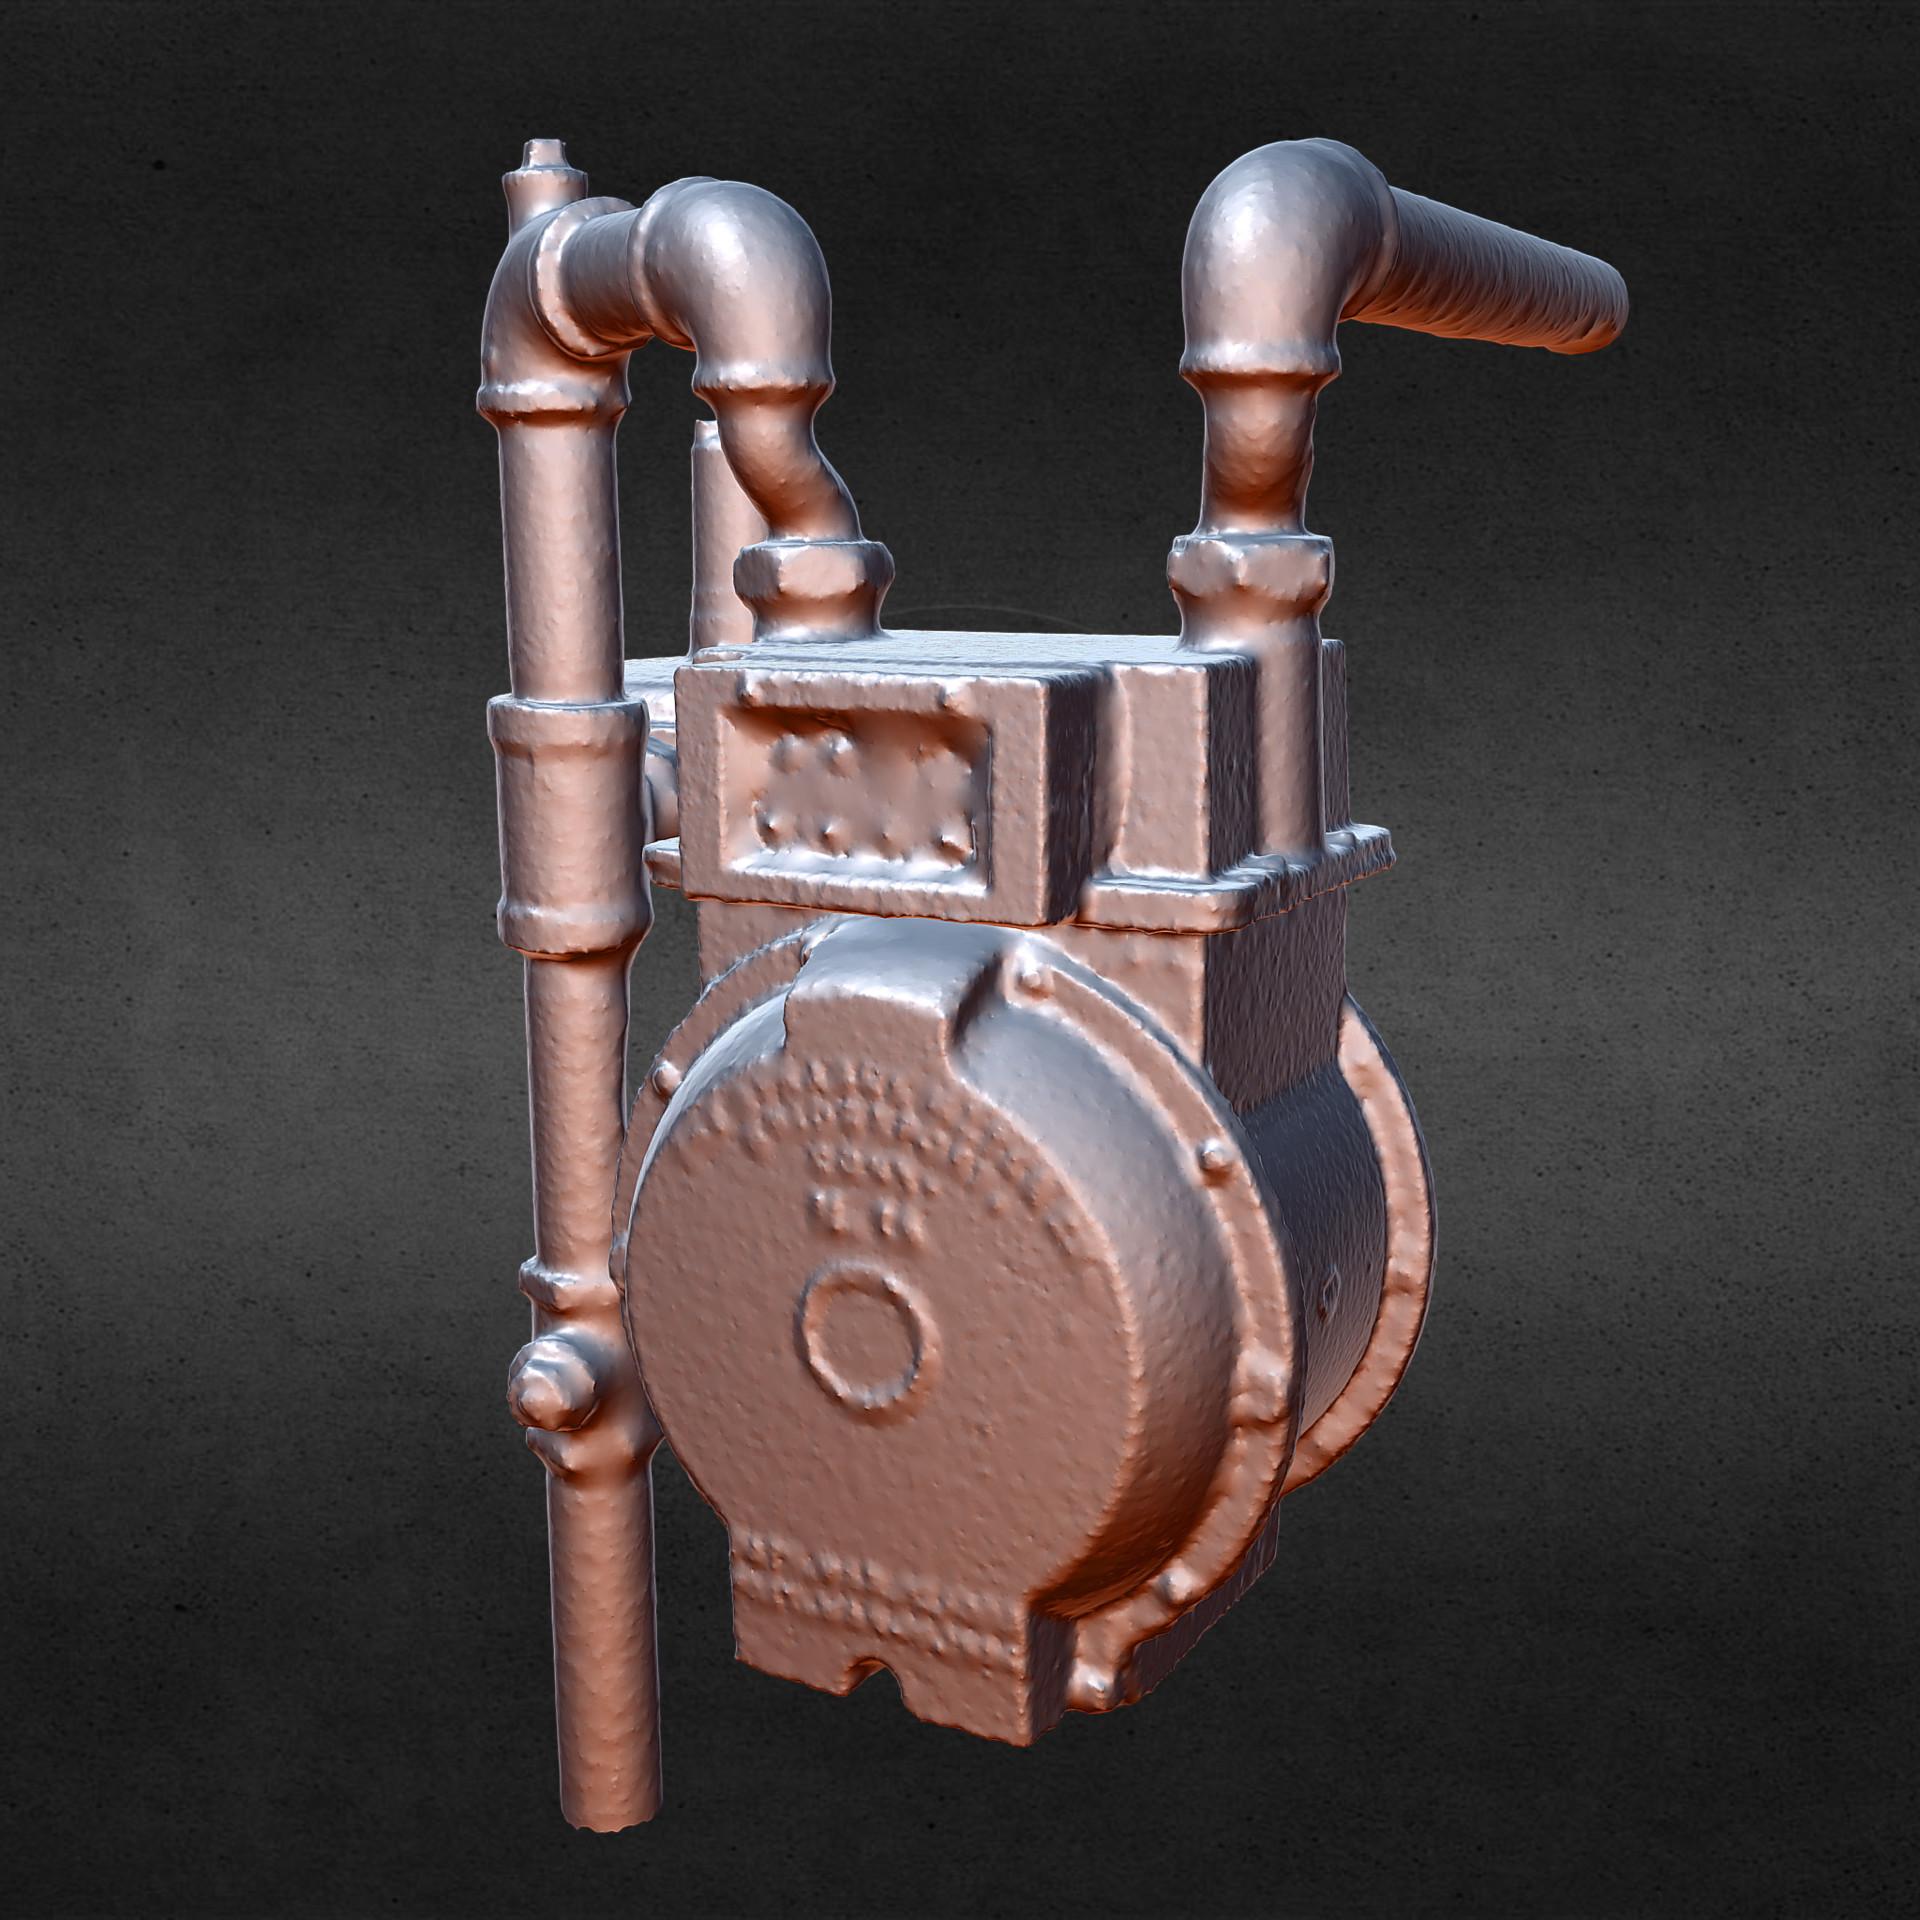 Andre bond gas meter 3